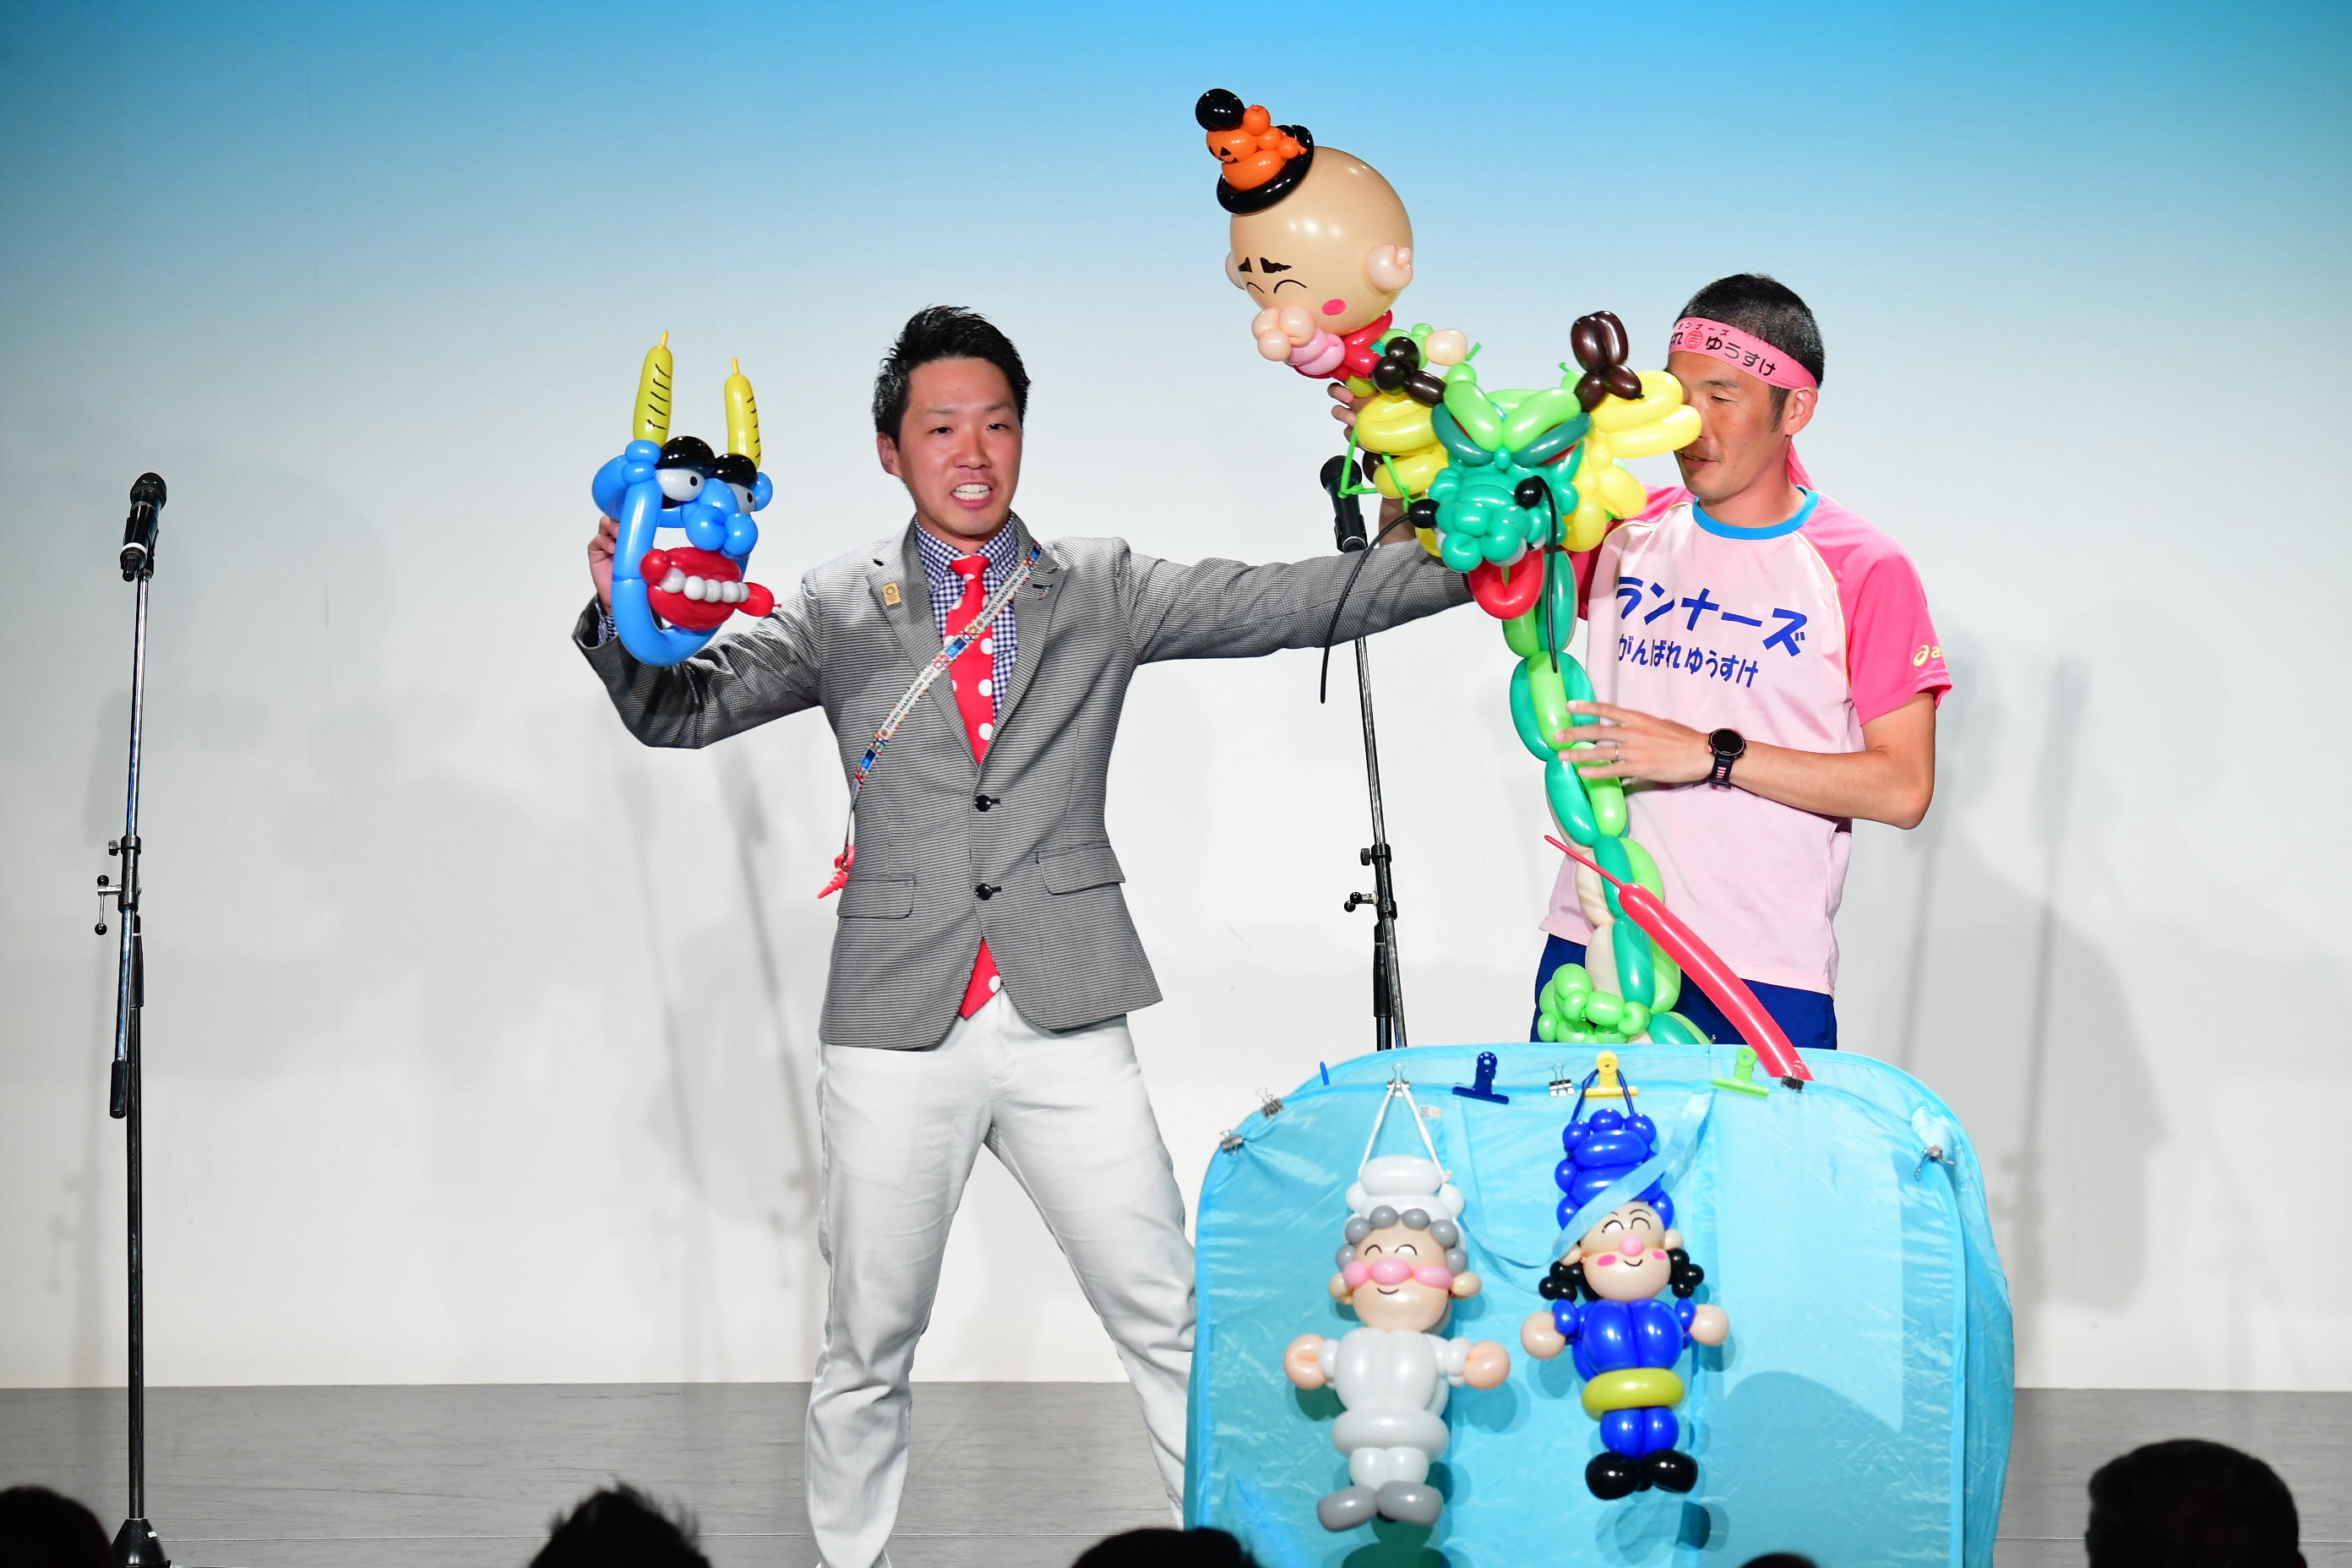 http://news.yoshimoto.co.jp/20181030230237-4e00d8a0b42a738a2b72f8103de4cc9f675b4b1c.jpg